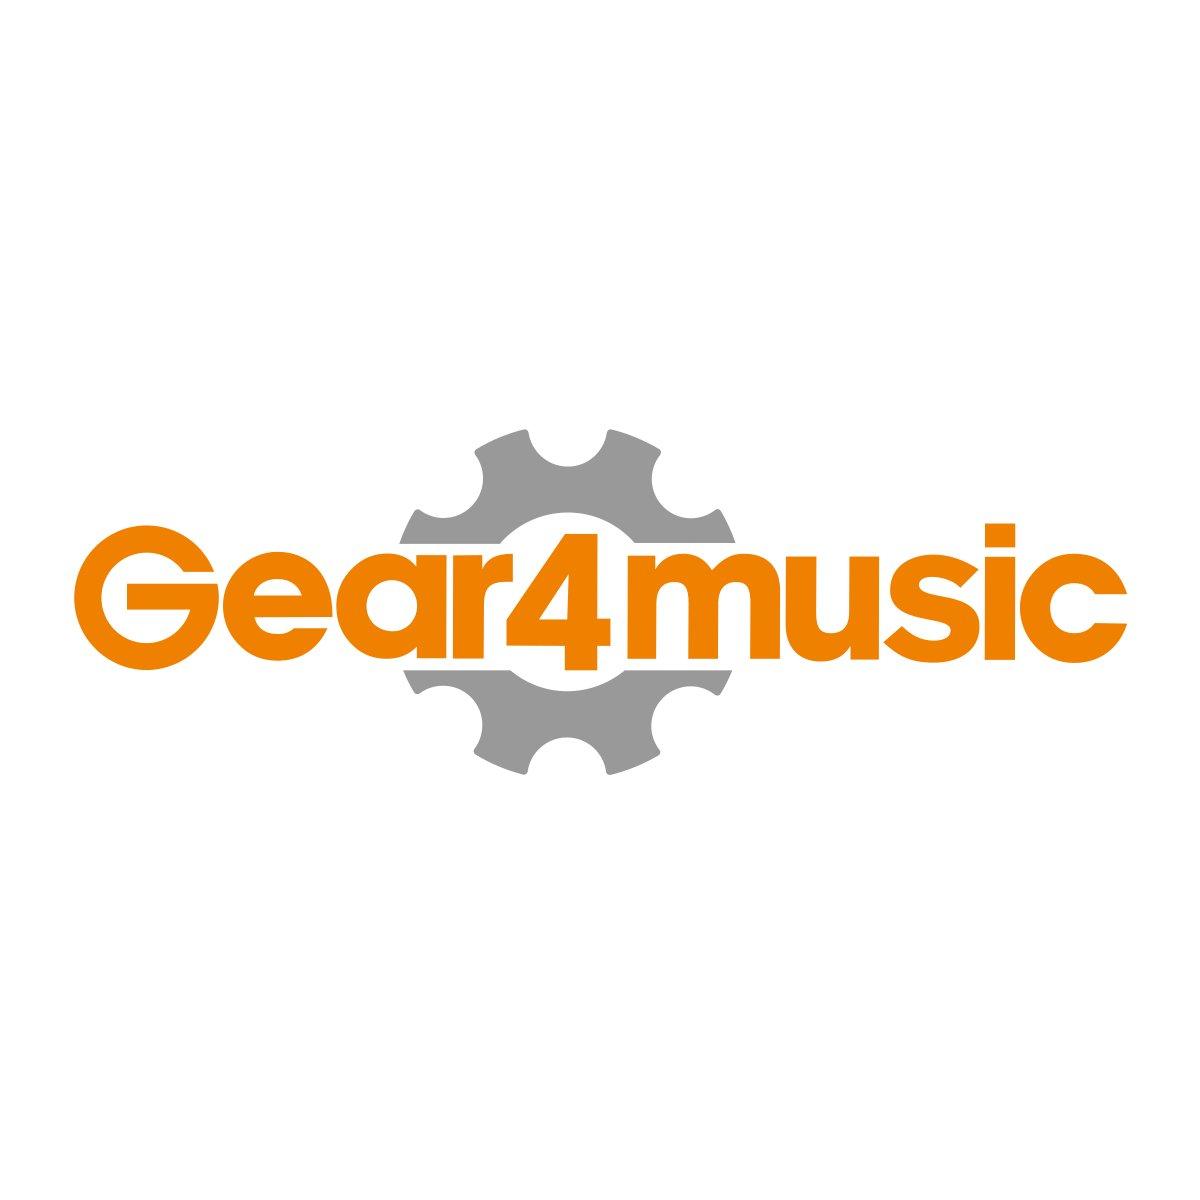 Behringer Audio Interface : behringer u phoria umc22 usb audio interface at gear4music ~ Russianpoet.info Haus und Dekorationen